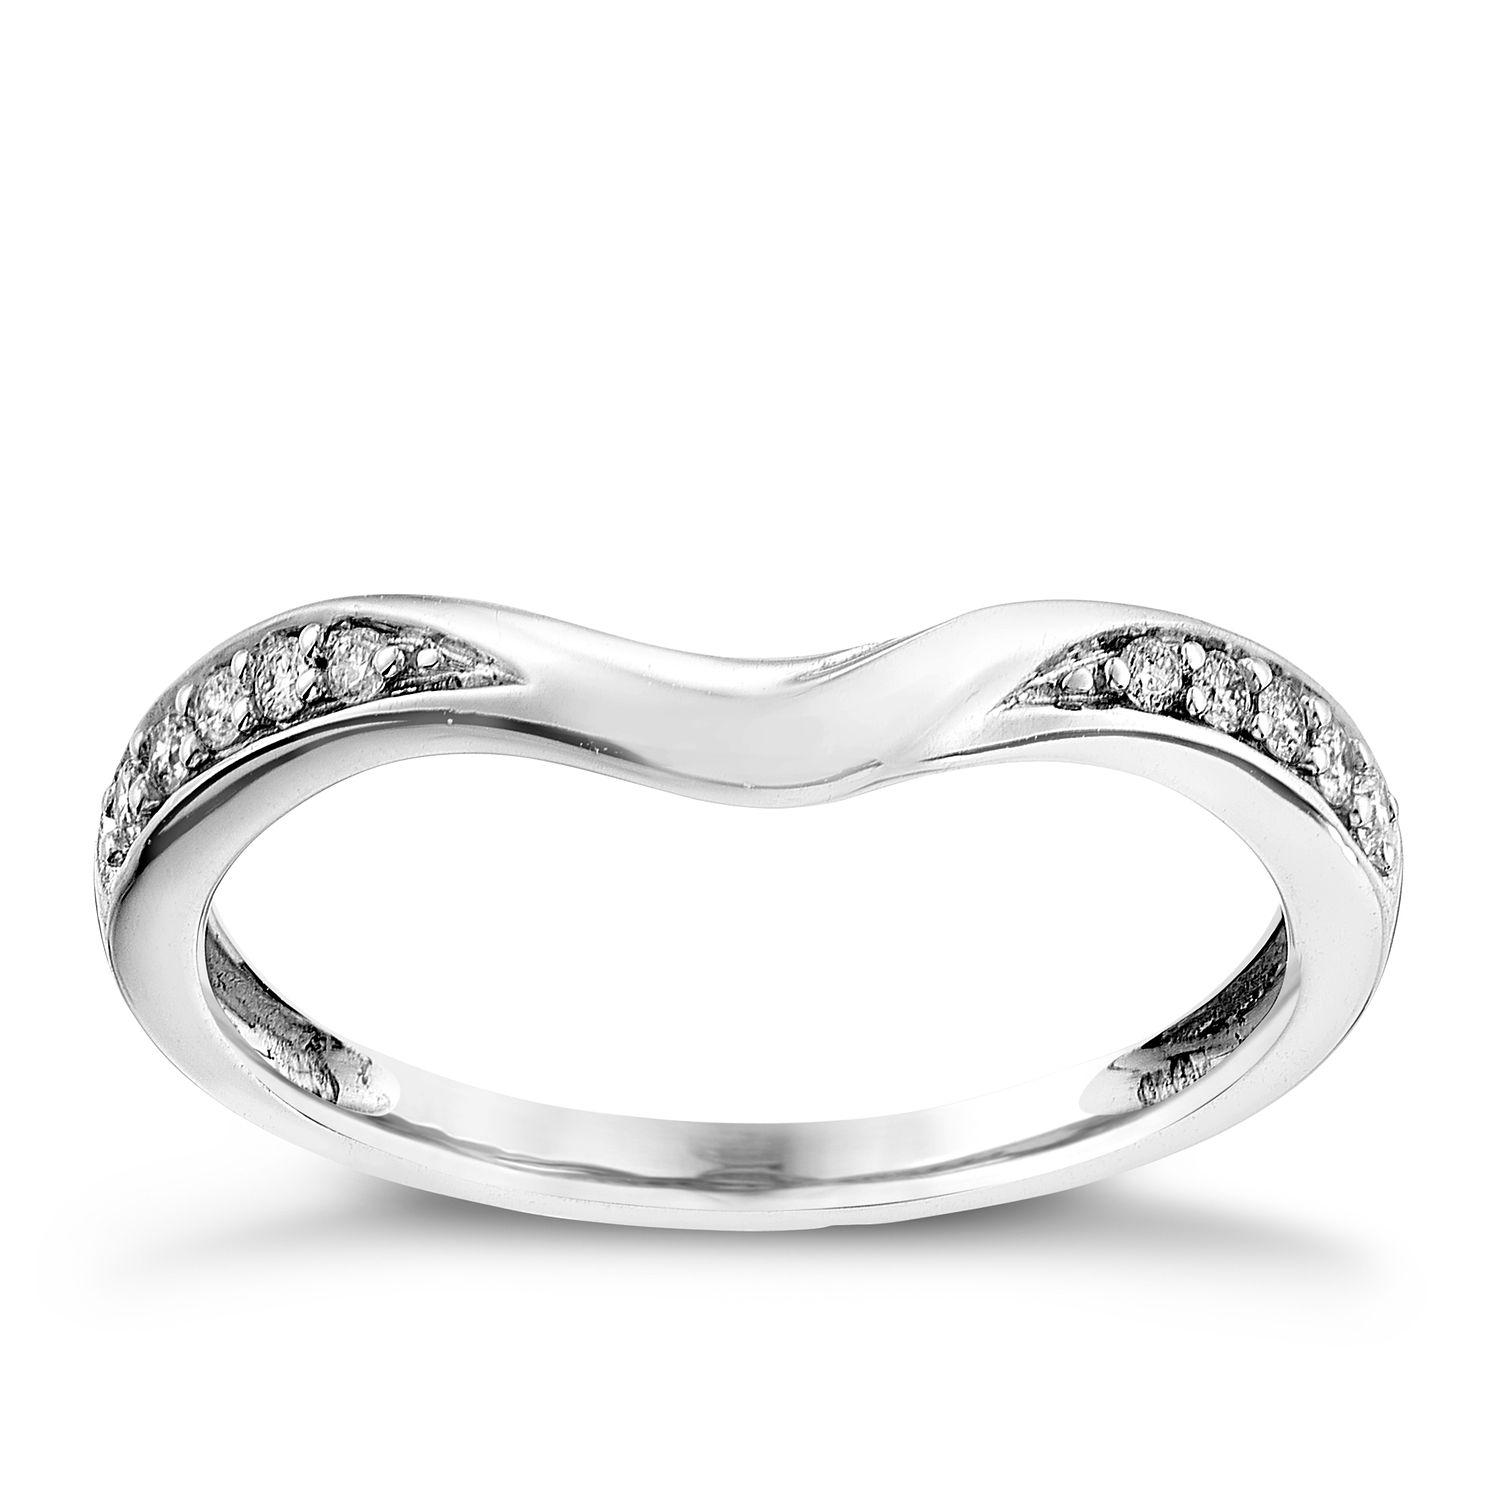 9ct white gold 010CT diamond shaped wedding ring Ernest Jones